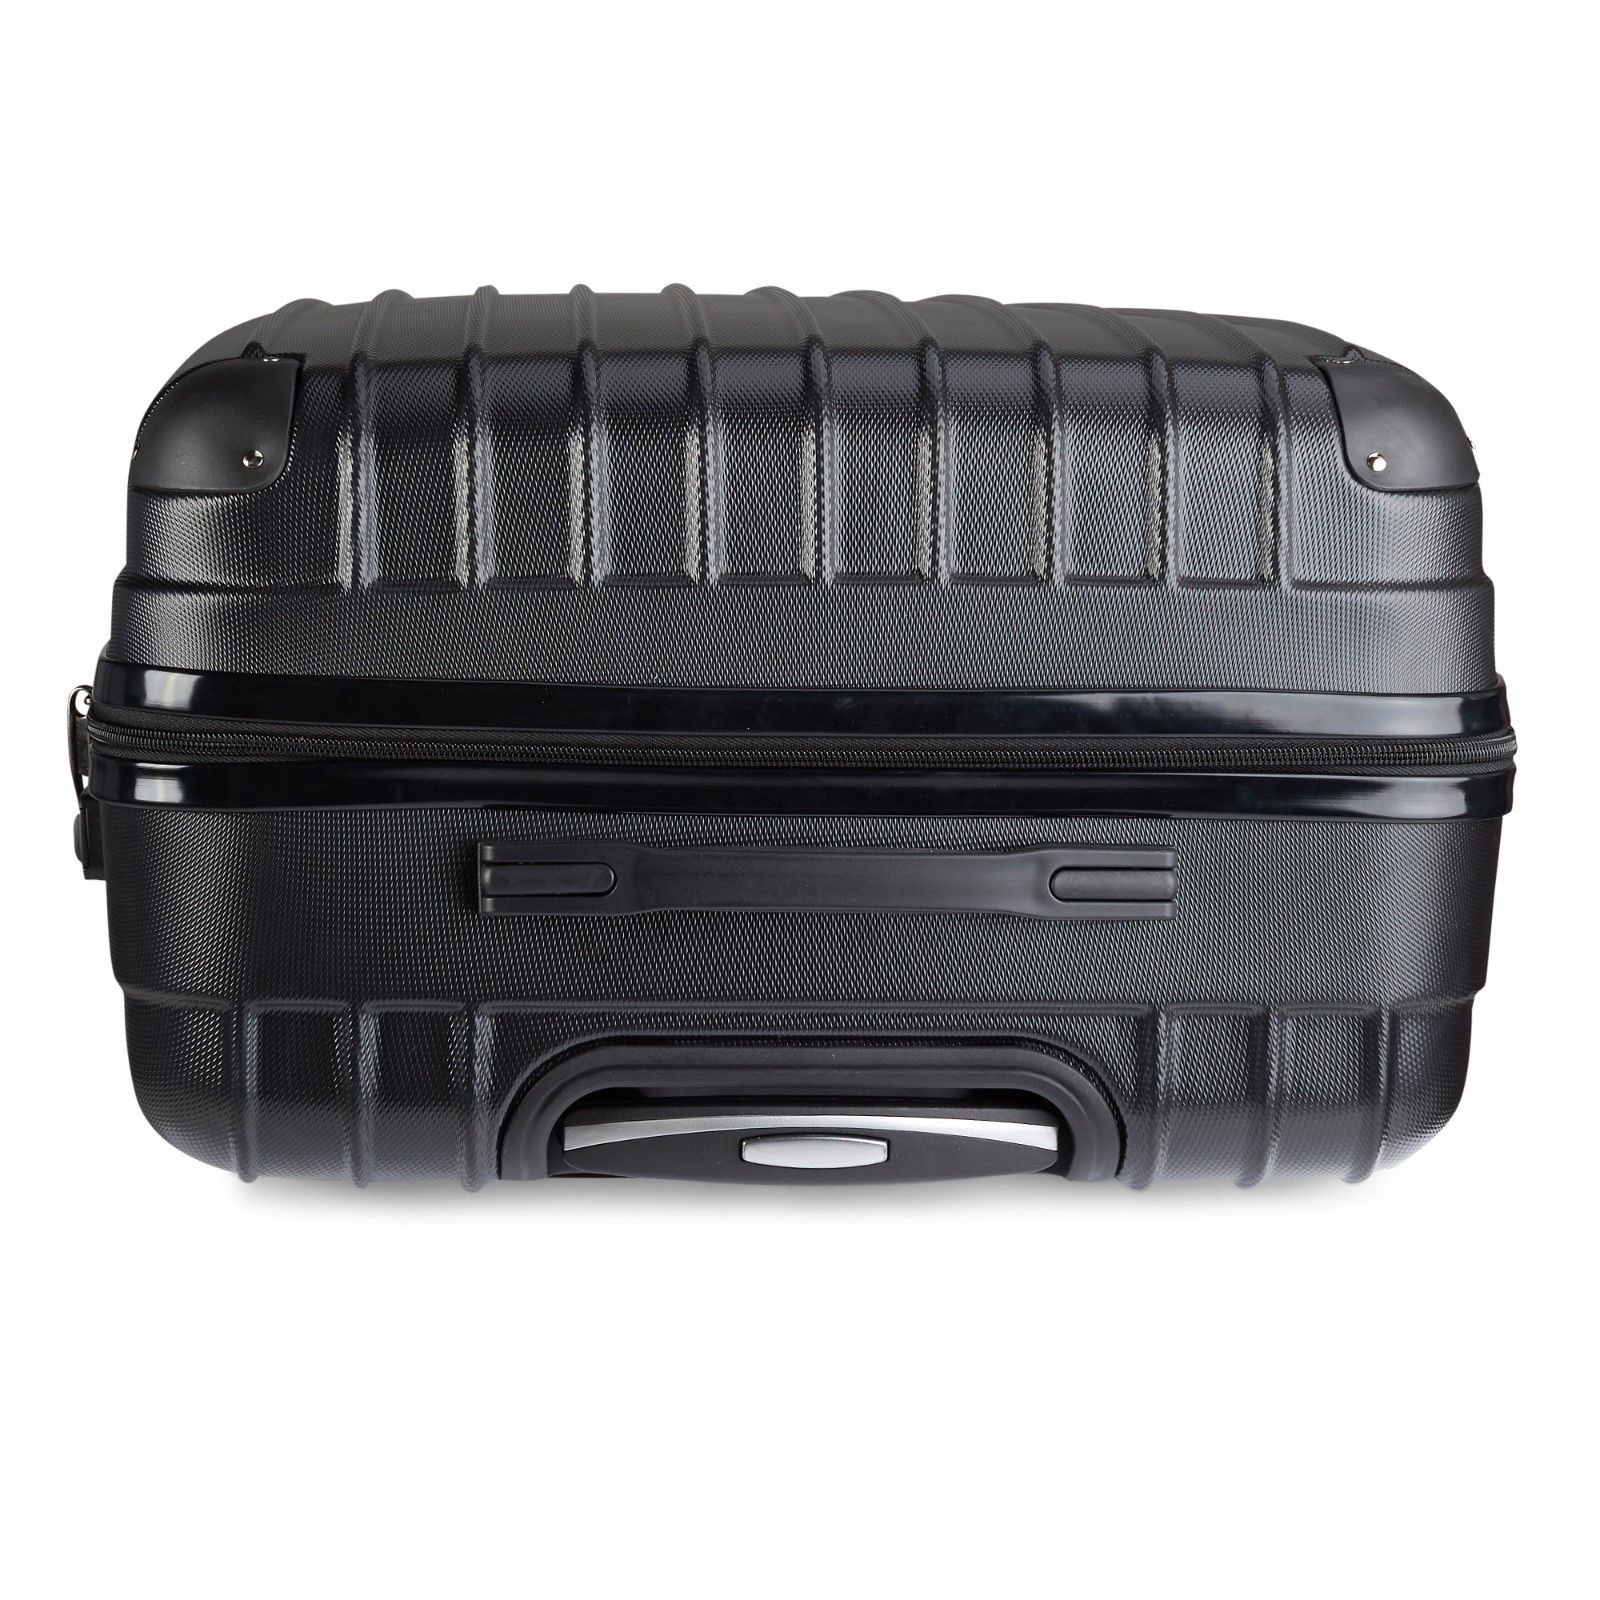 Milano-Premium-3pc-ABS-Luggage-Suitcase-Luxury-Hard-Case-Shockproof-Travel-Set thumbnail 11